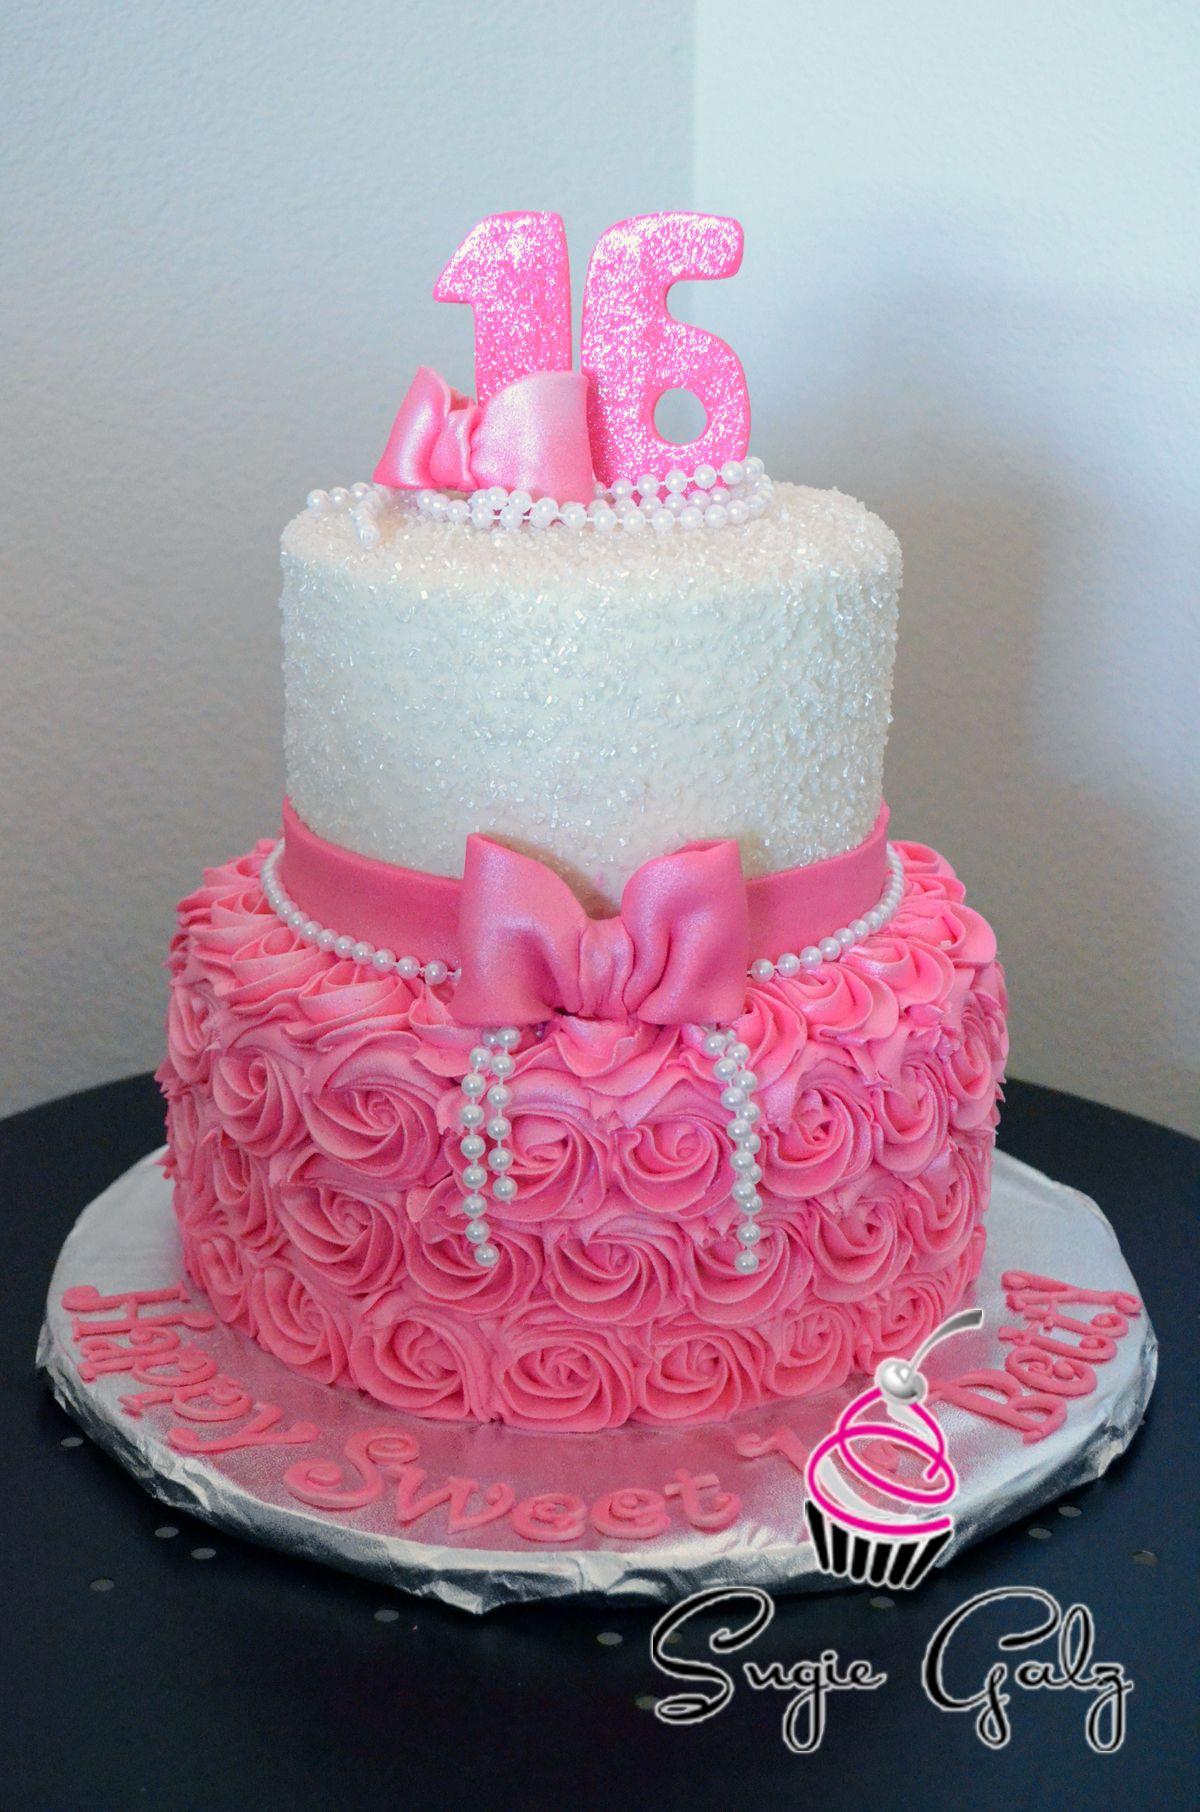 Sweet 16 Birthday Cake Fun by Sugie Galz in Austin Texas Birthday